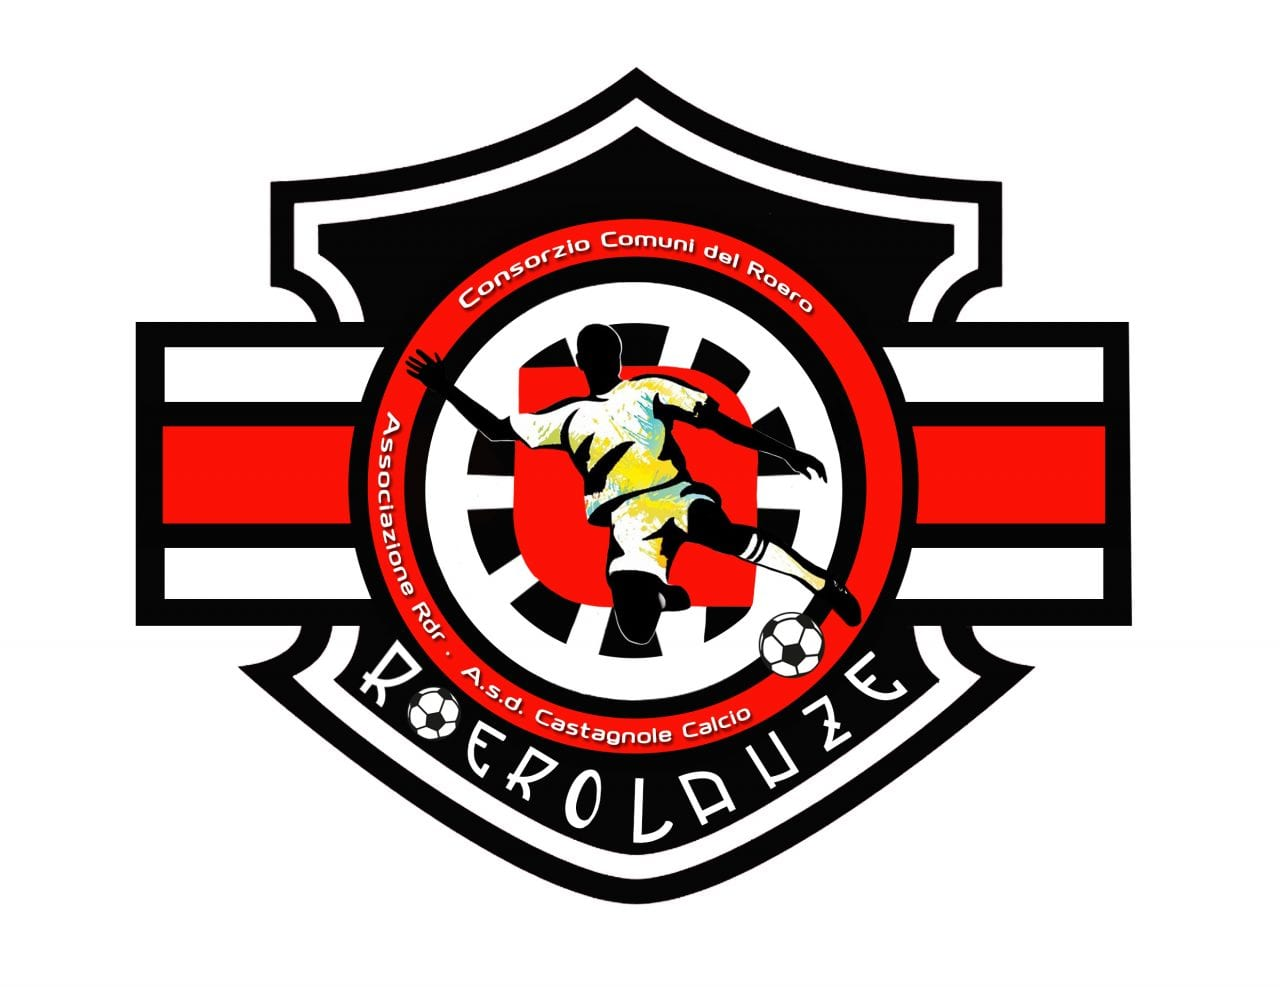 ROERO-LANZE-4-1280x987.jpg